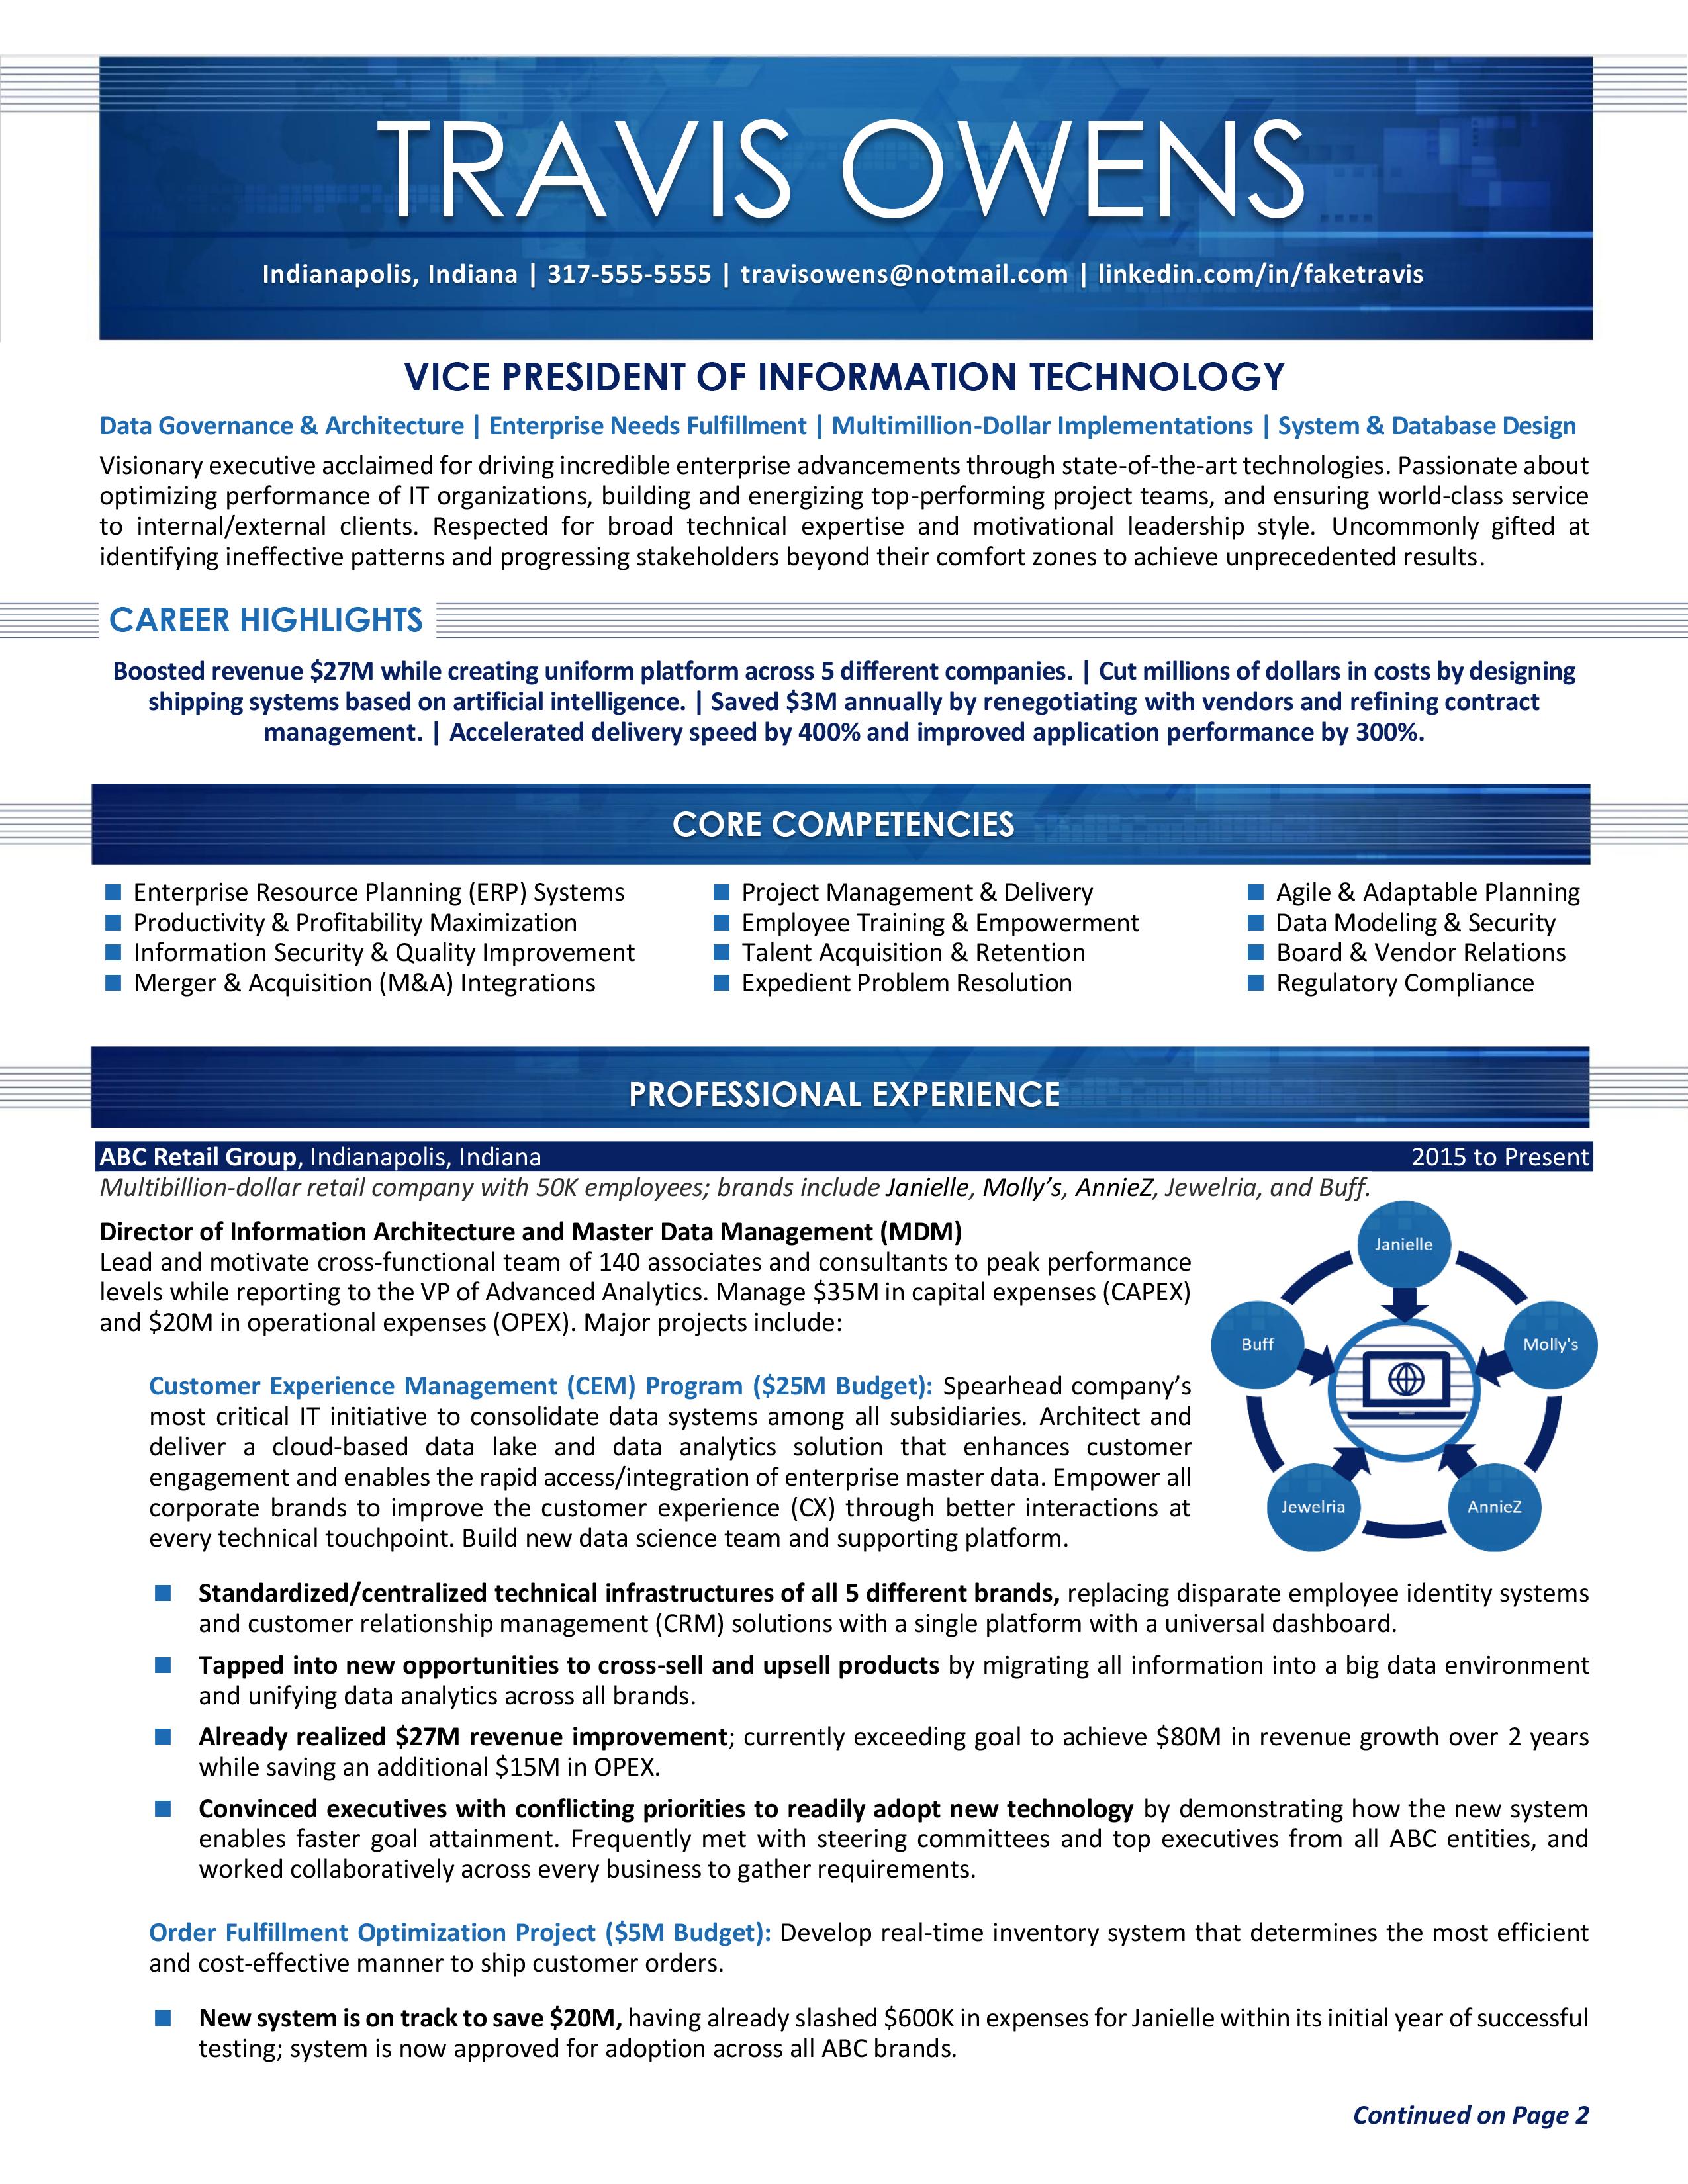 Vice President Of Information Technology Resume Sample Resume Executive Resume Resume Services